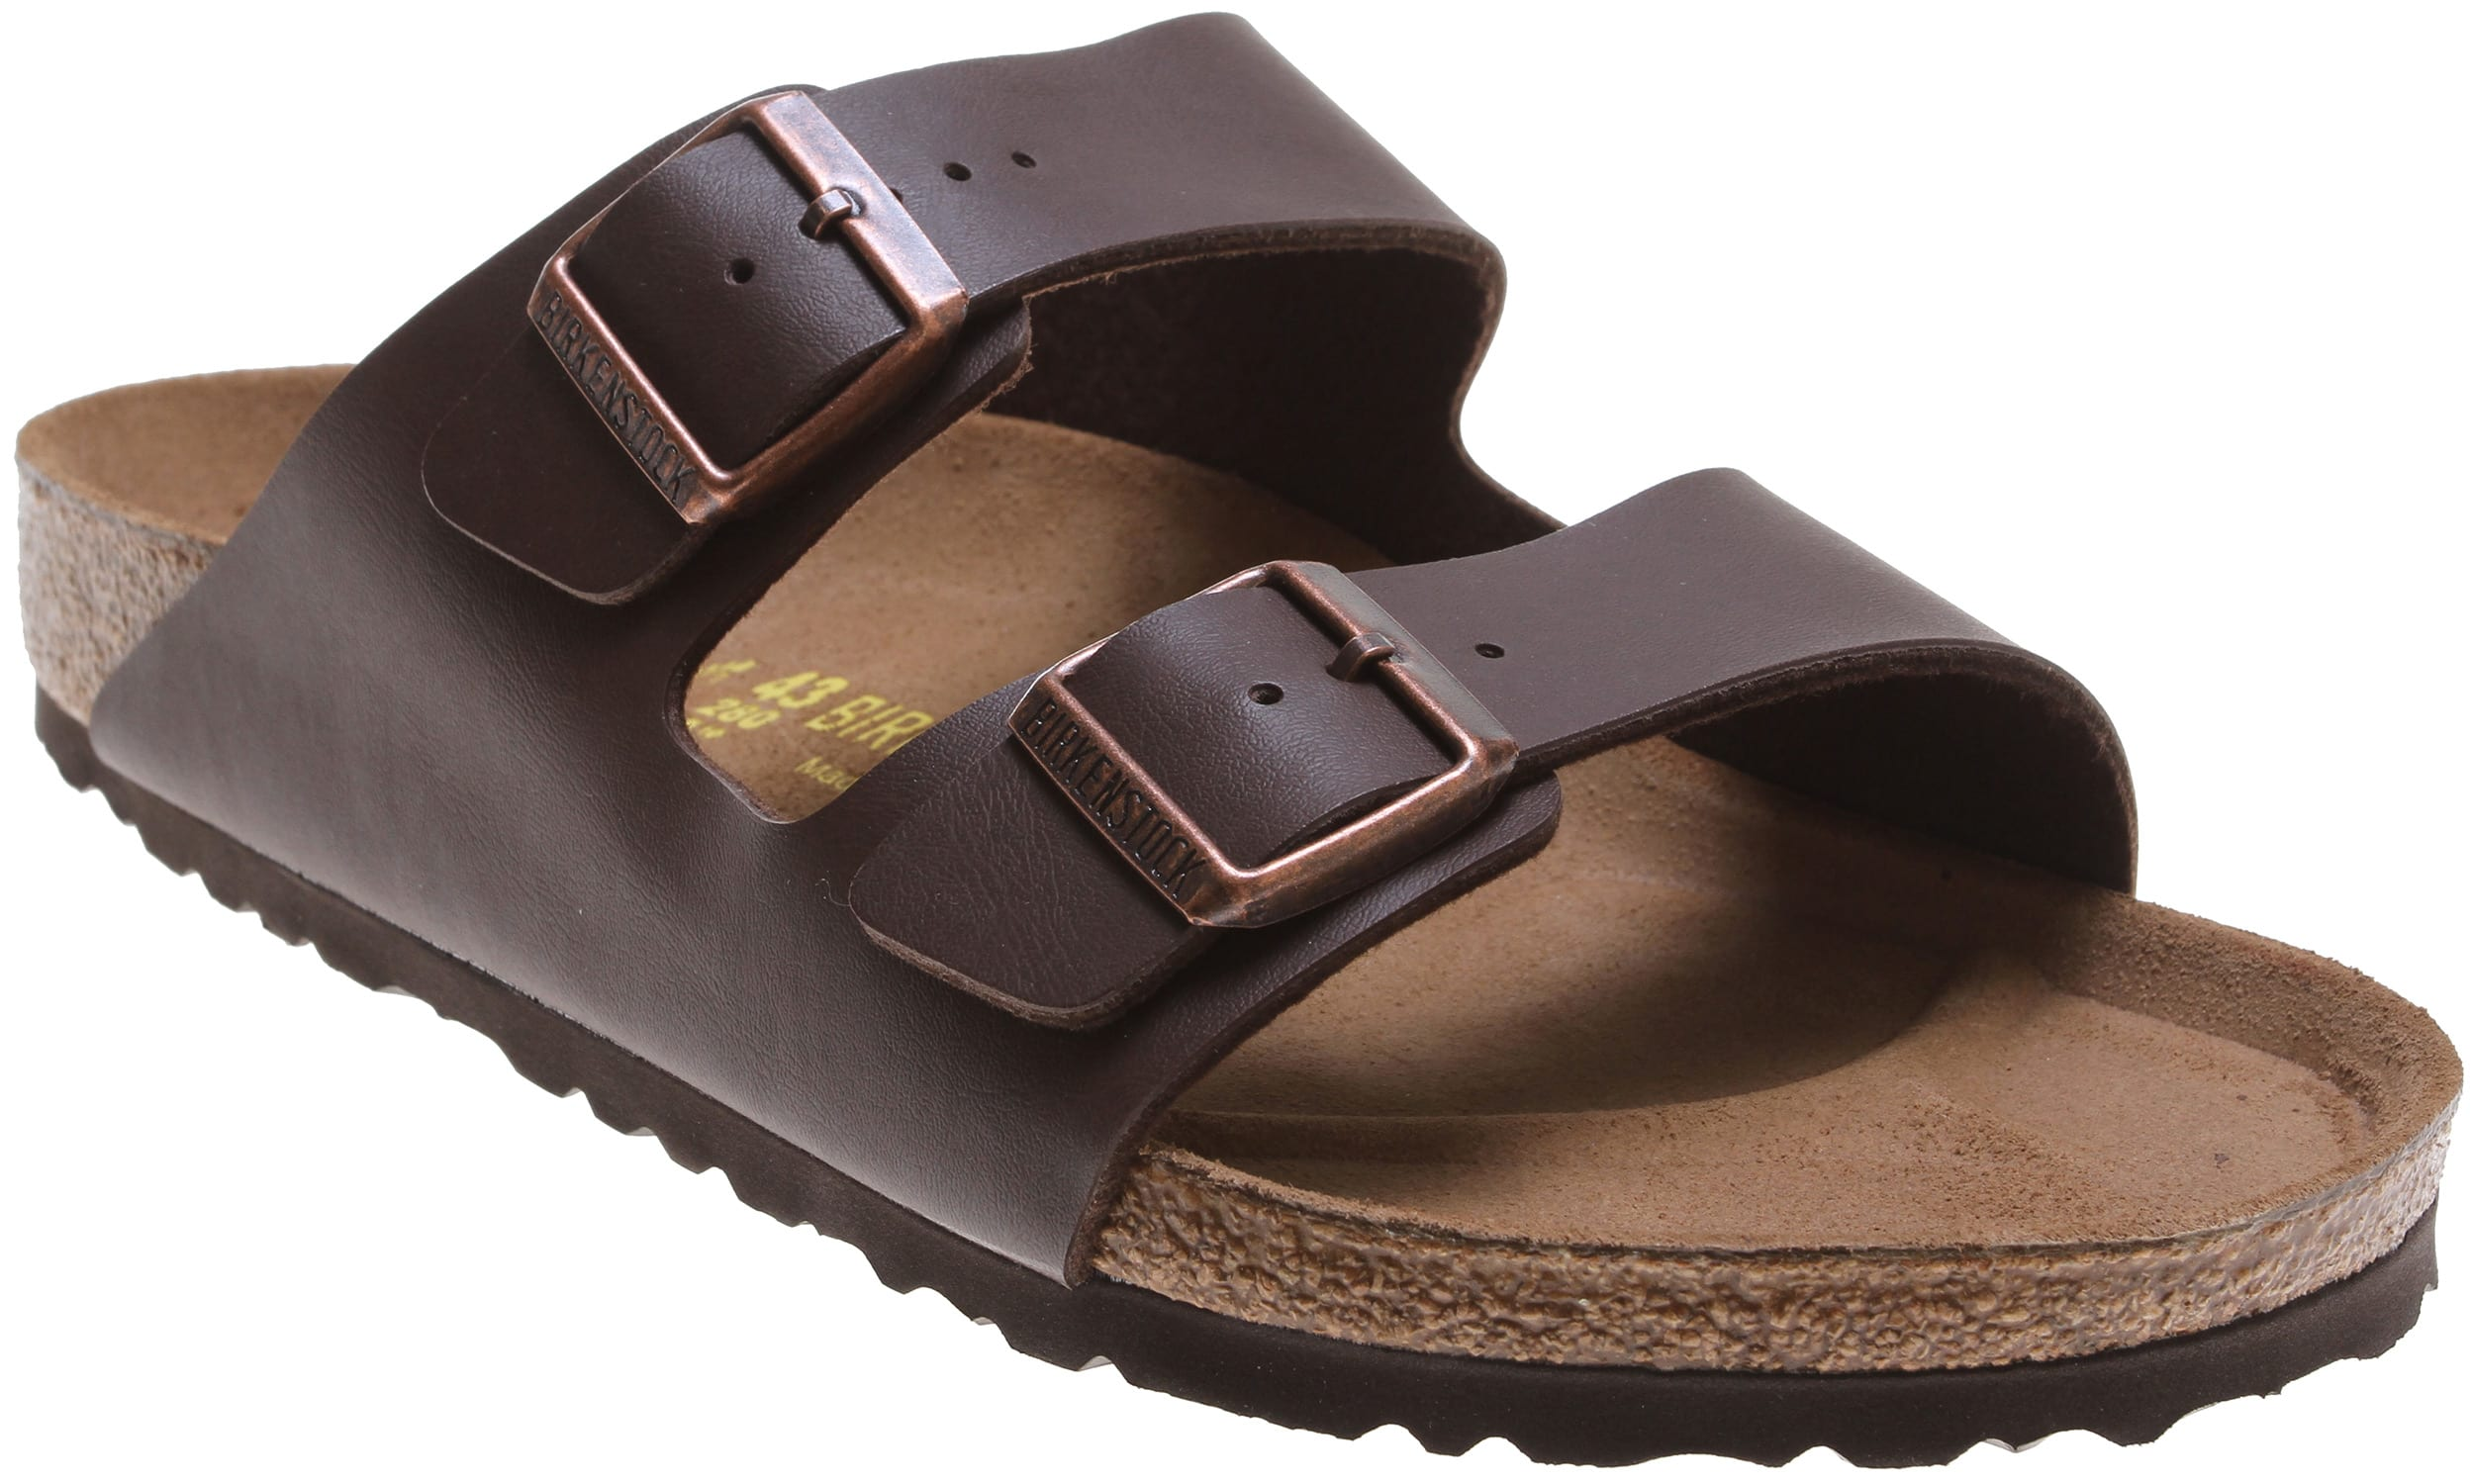 Birkenstock Sandals Are On Sale: On Sale Birkenstock Arizona Sandals Up To 40% Off